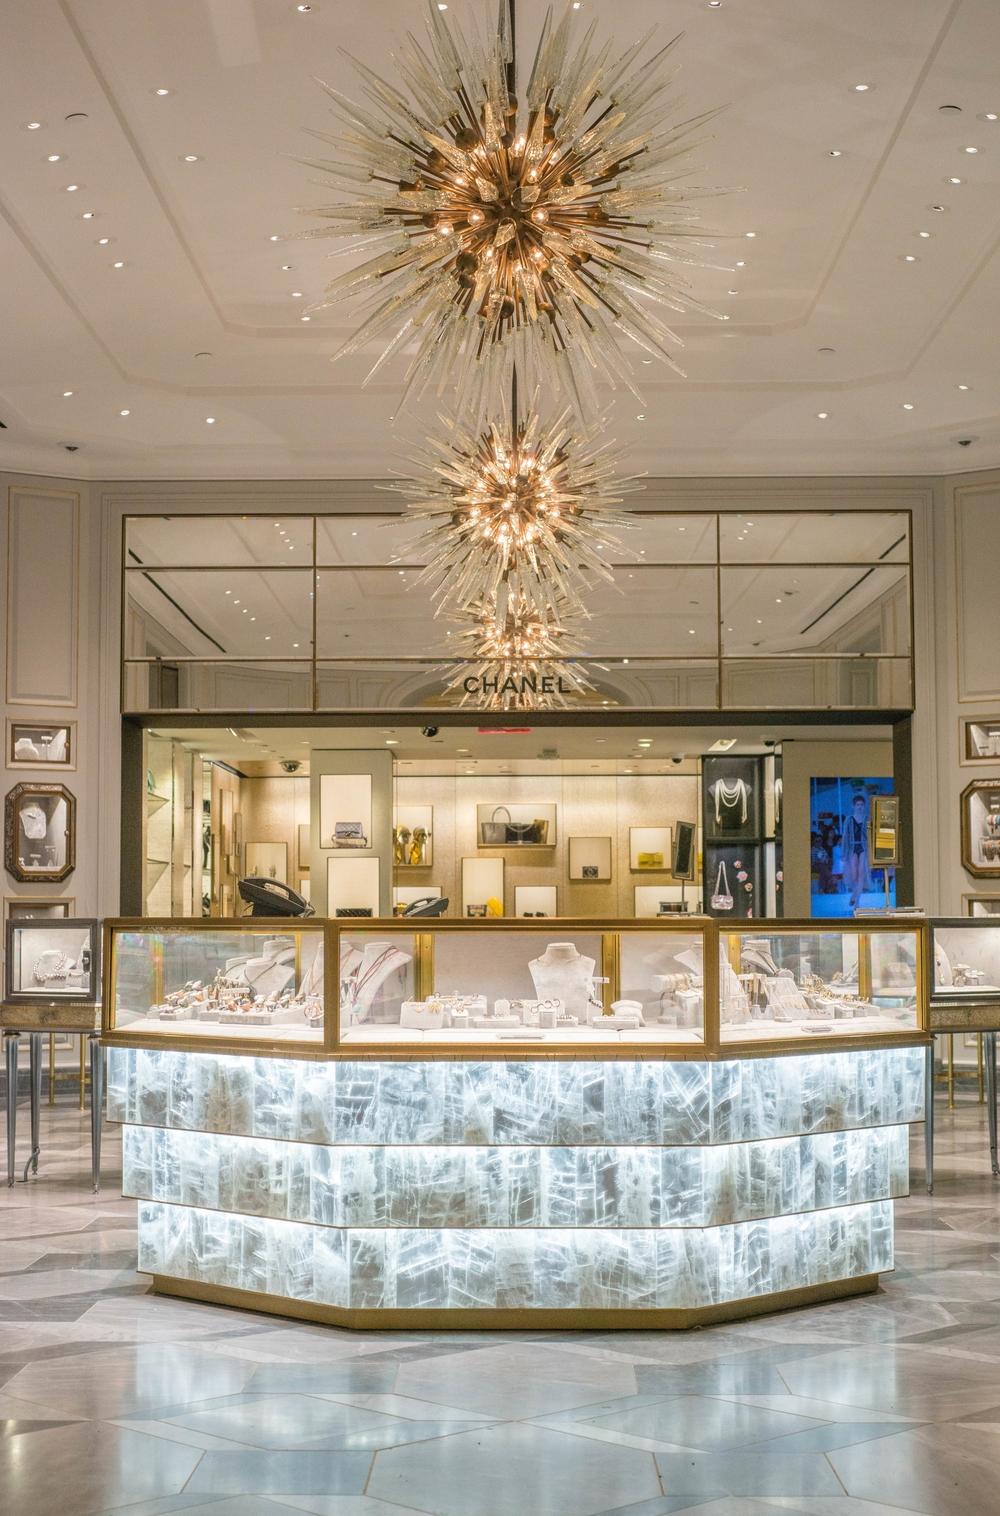 Union_Adorn_BG_Jewelry_Salon-3.jpg